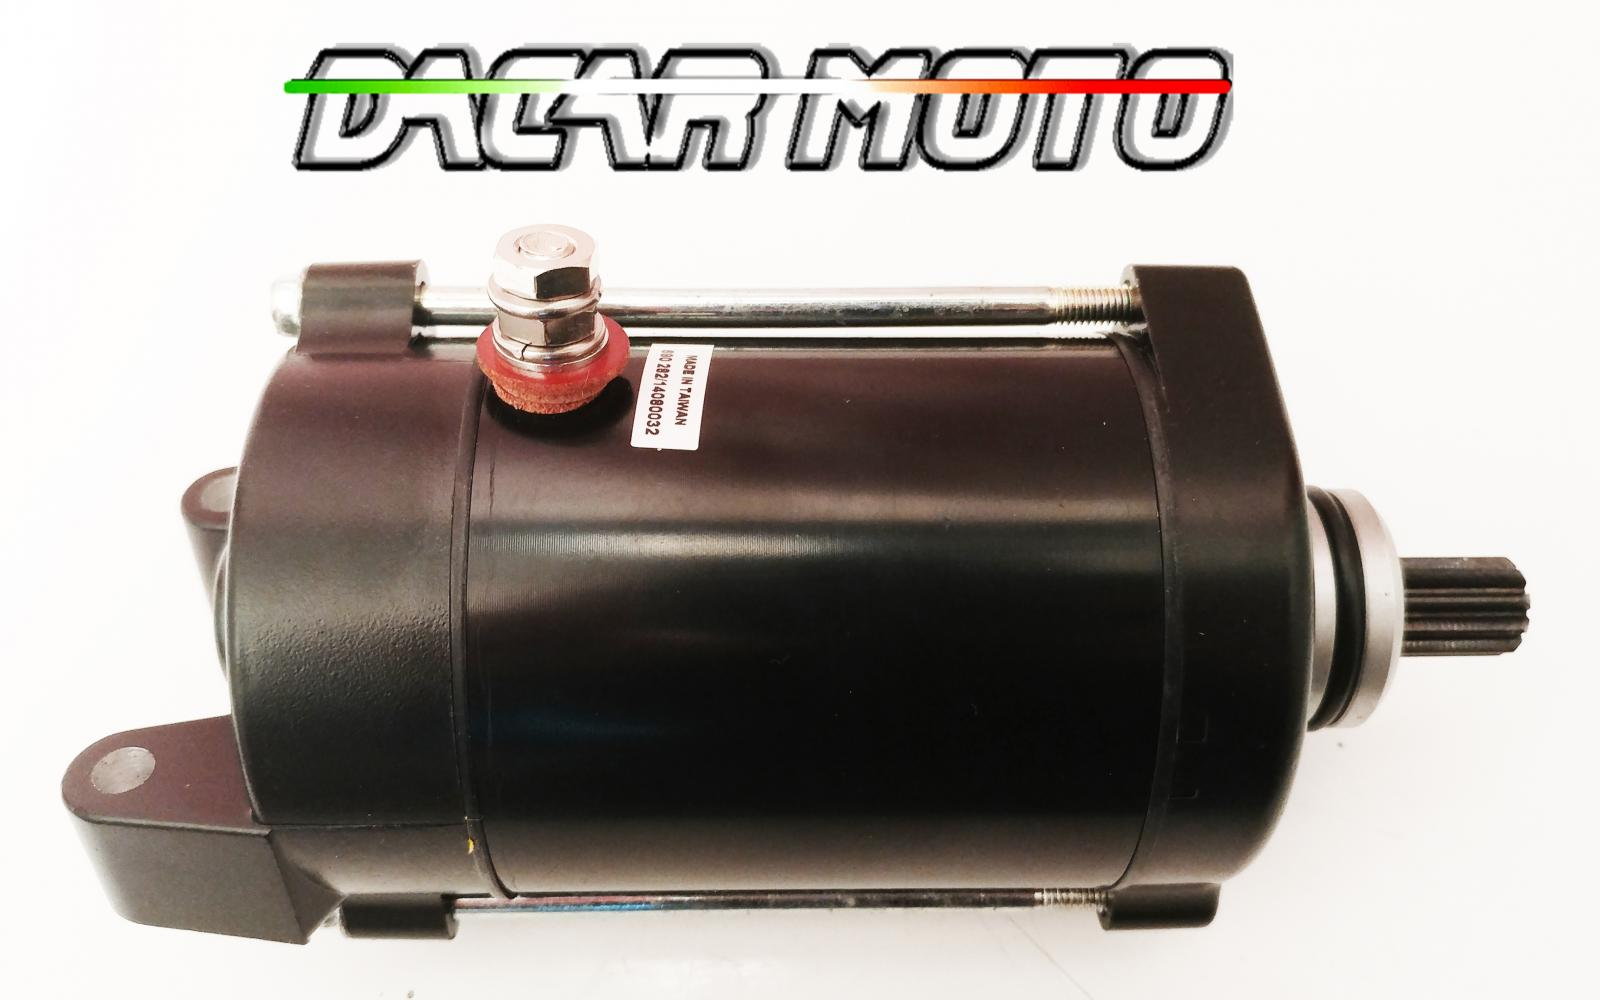 30x30cm IT Adam Home Qualit/à fibra cava Cuscino Inserire Filler Interno 12x12